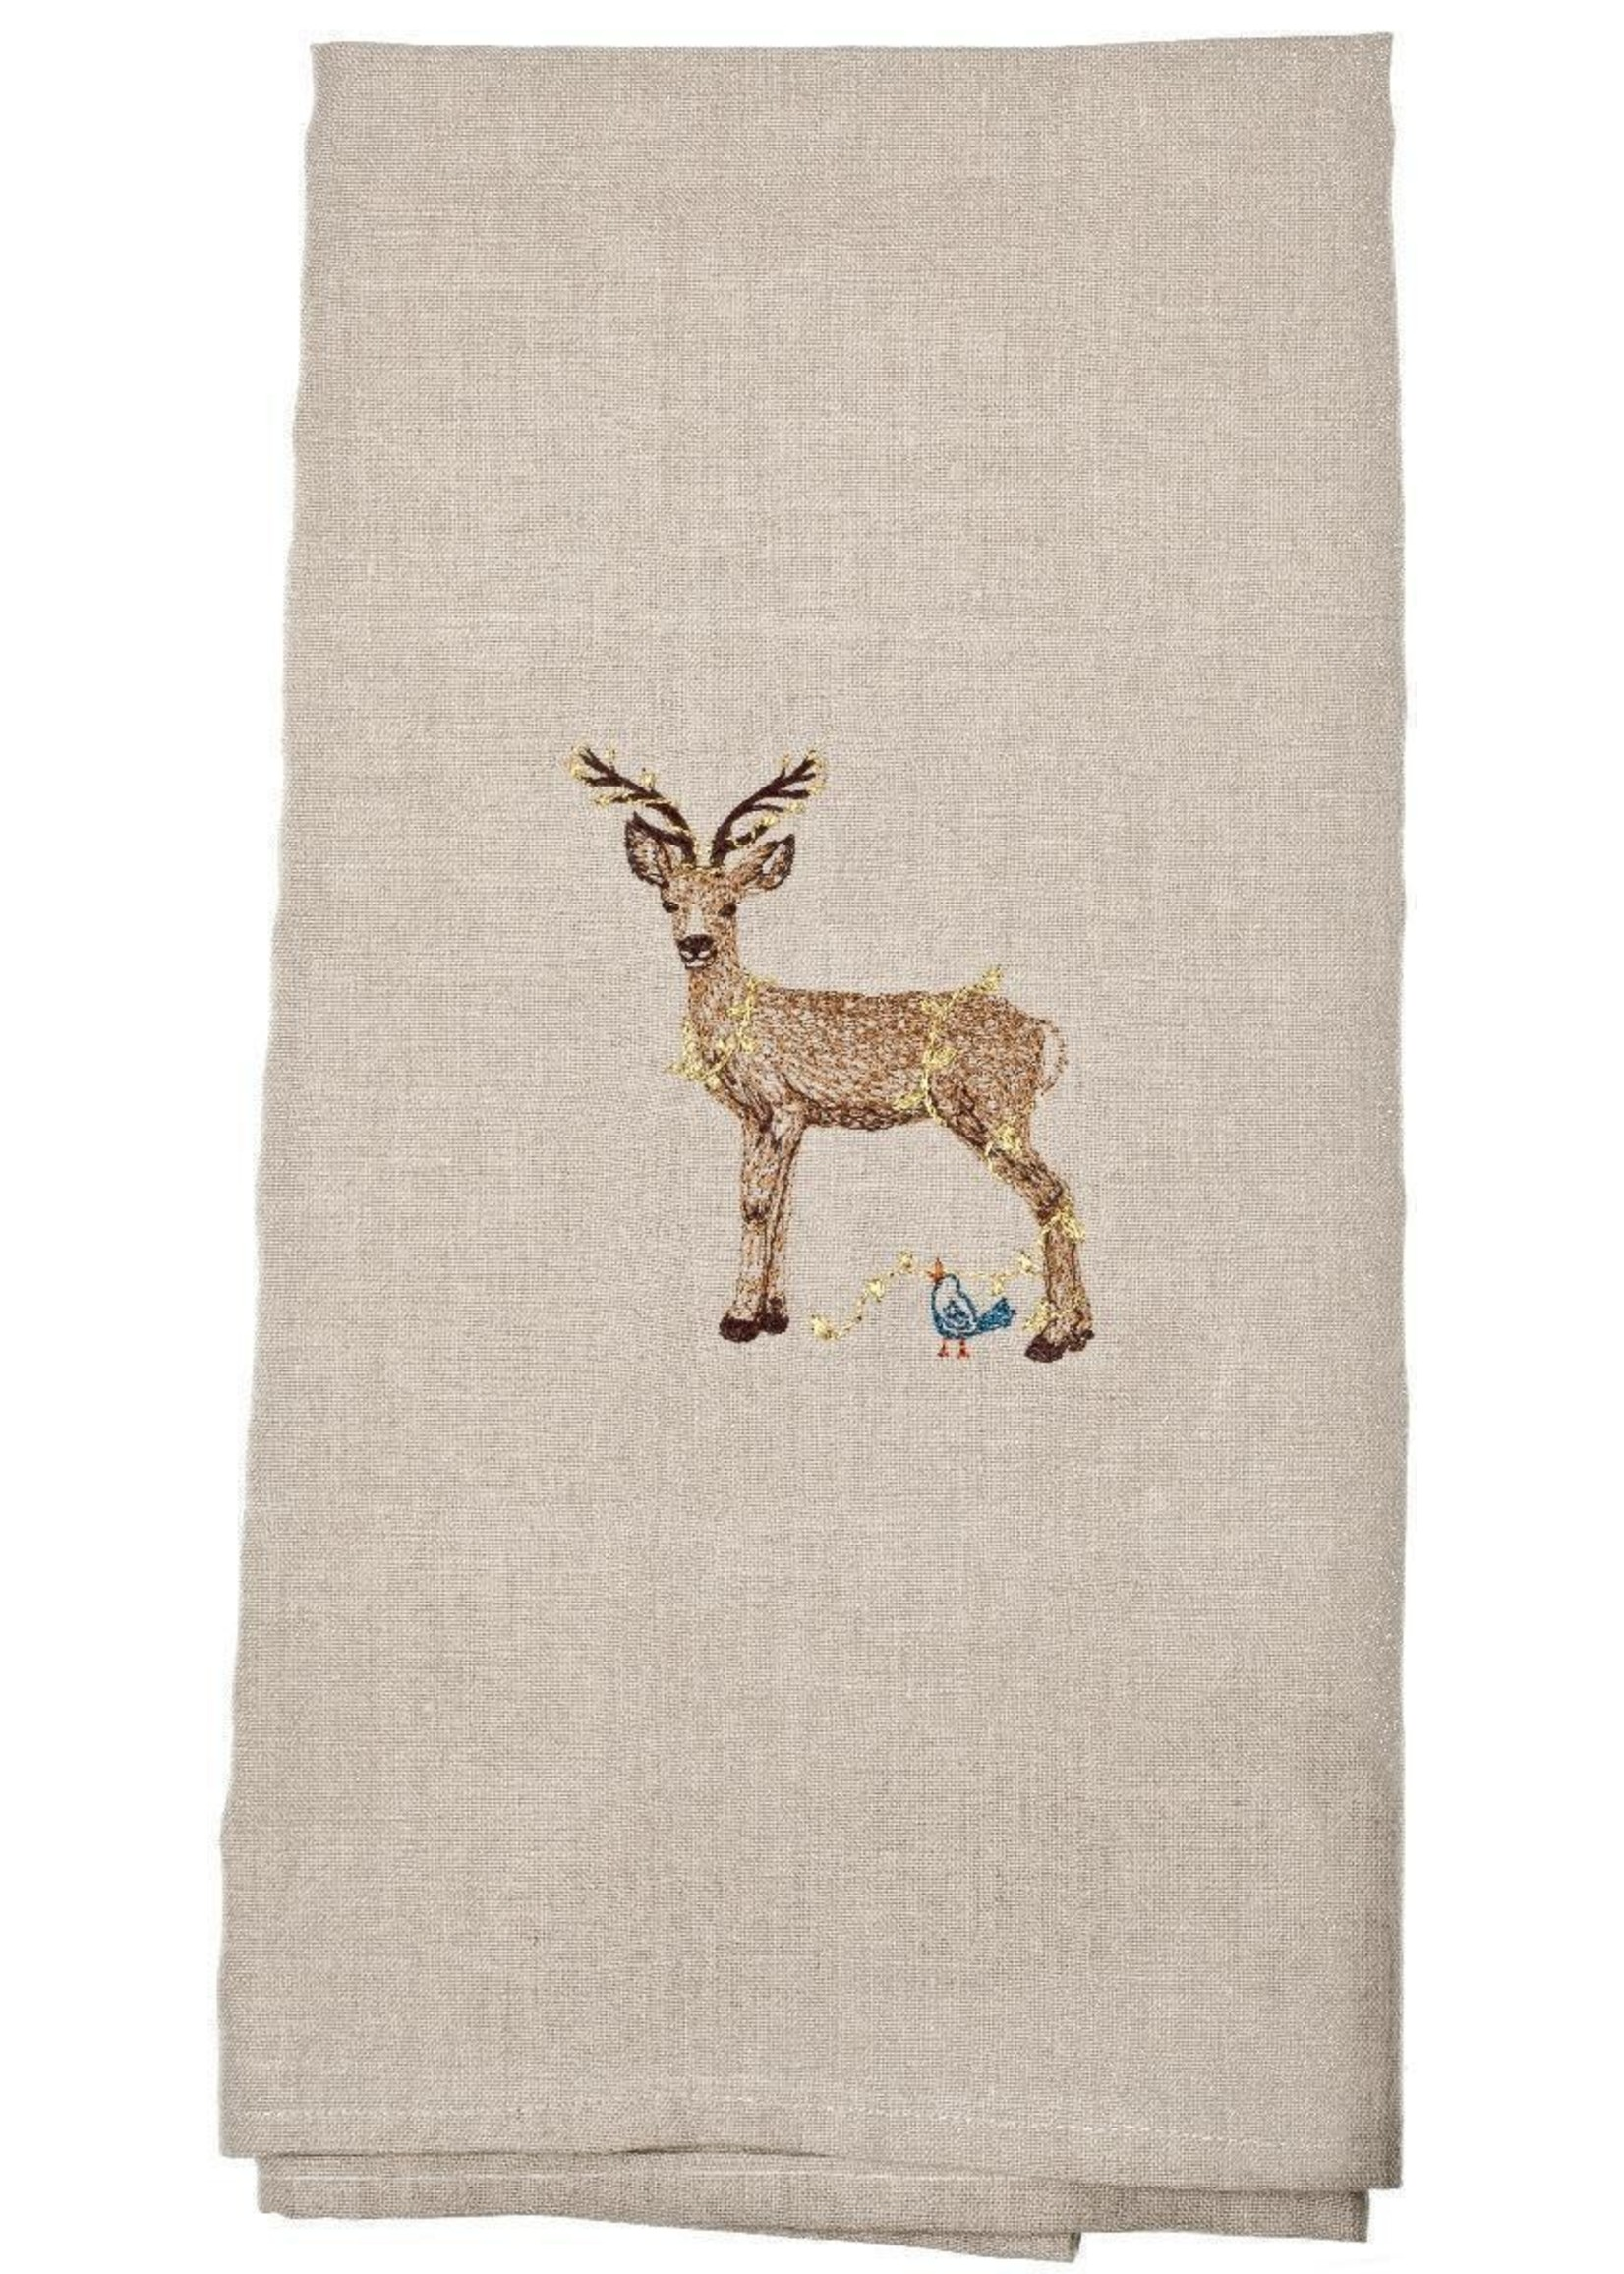 Coral and Tusk Tea Towel - Deer with Lights